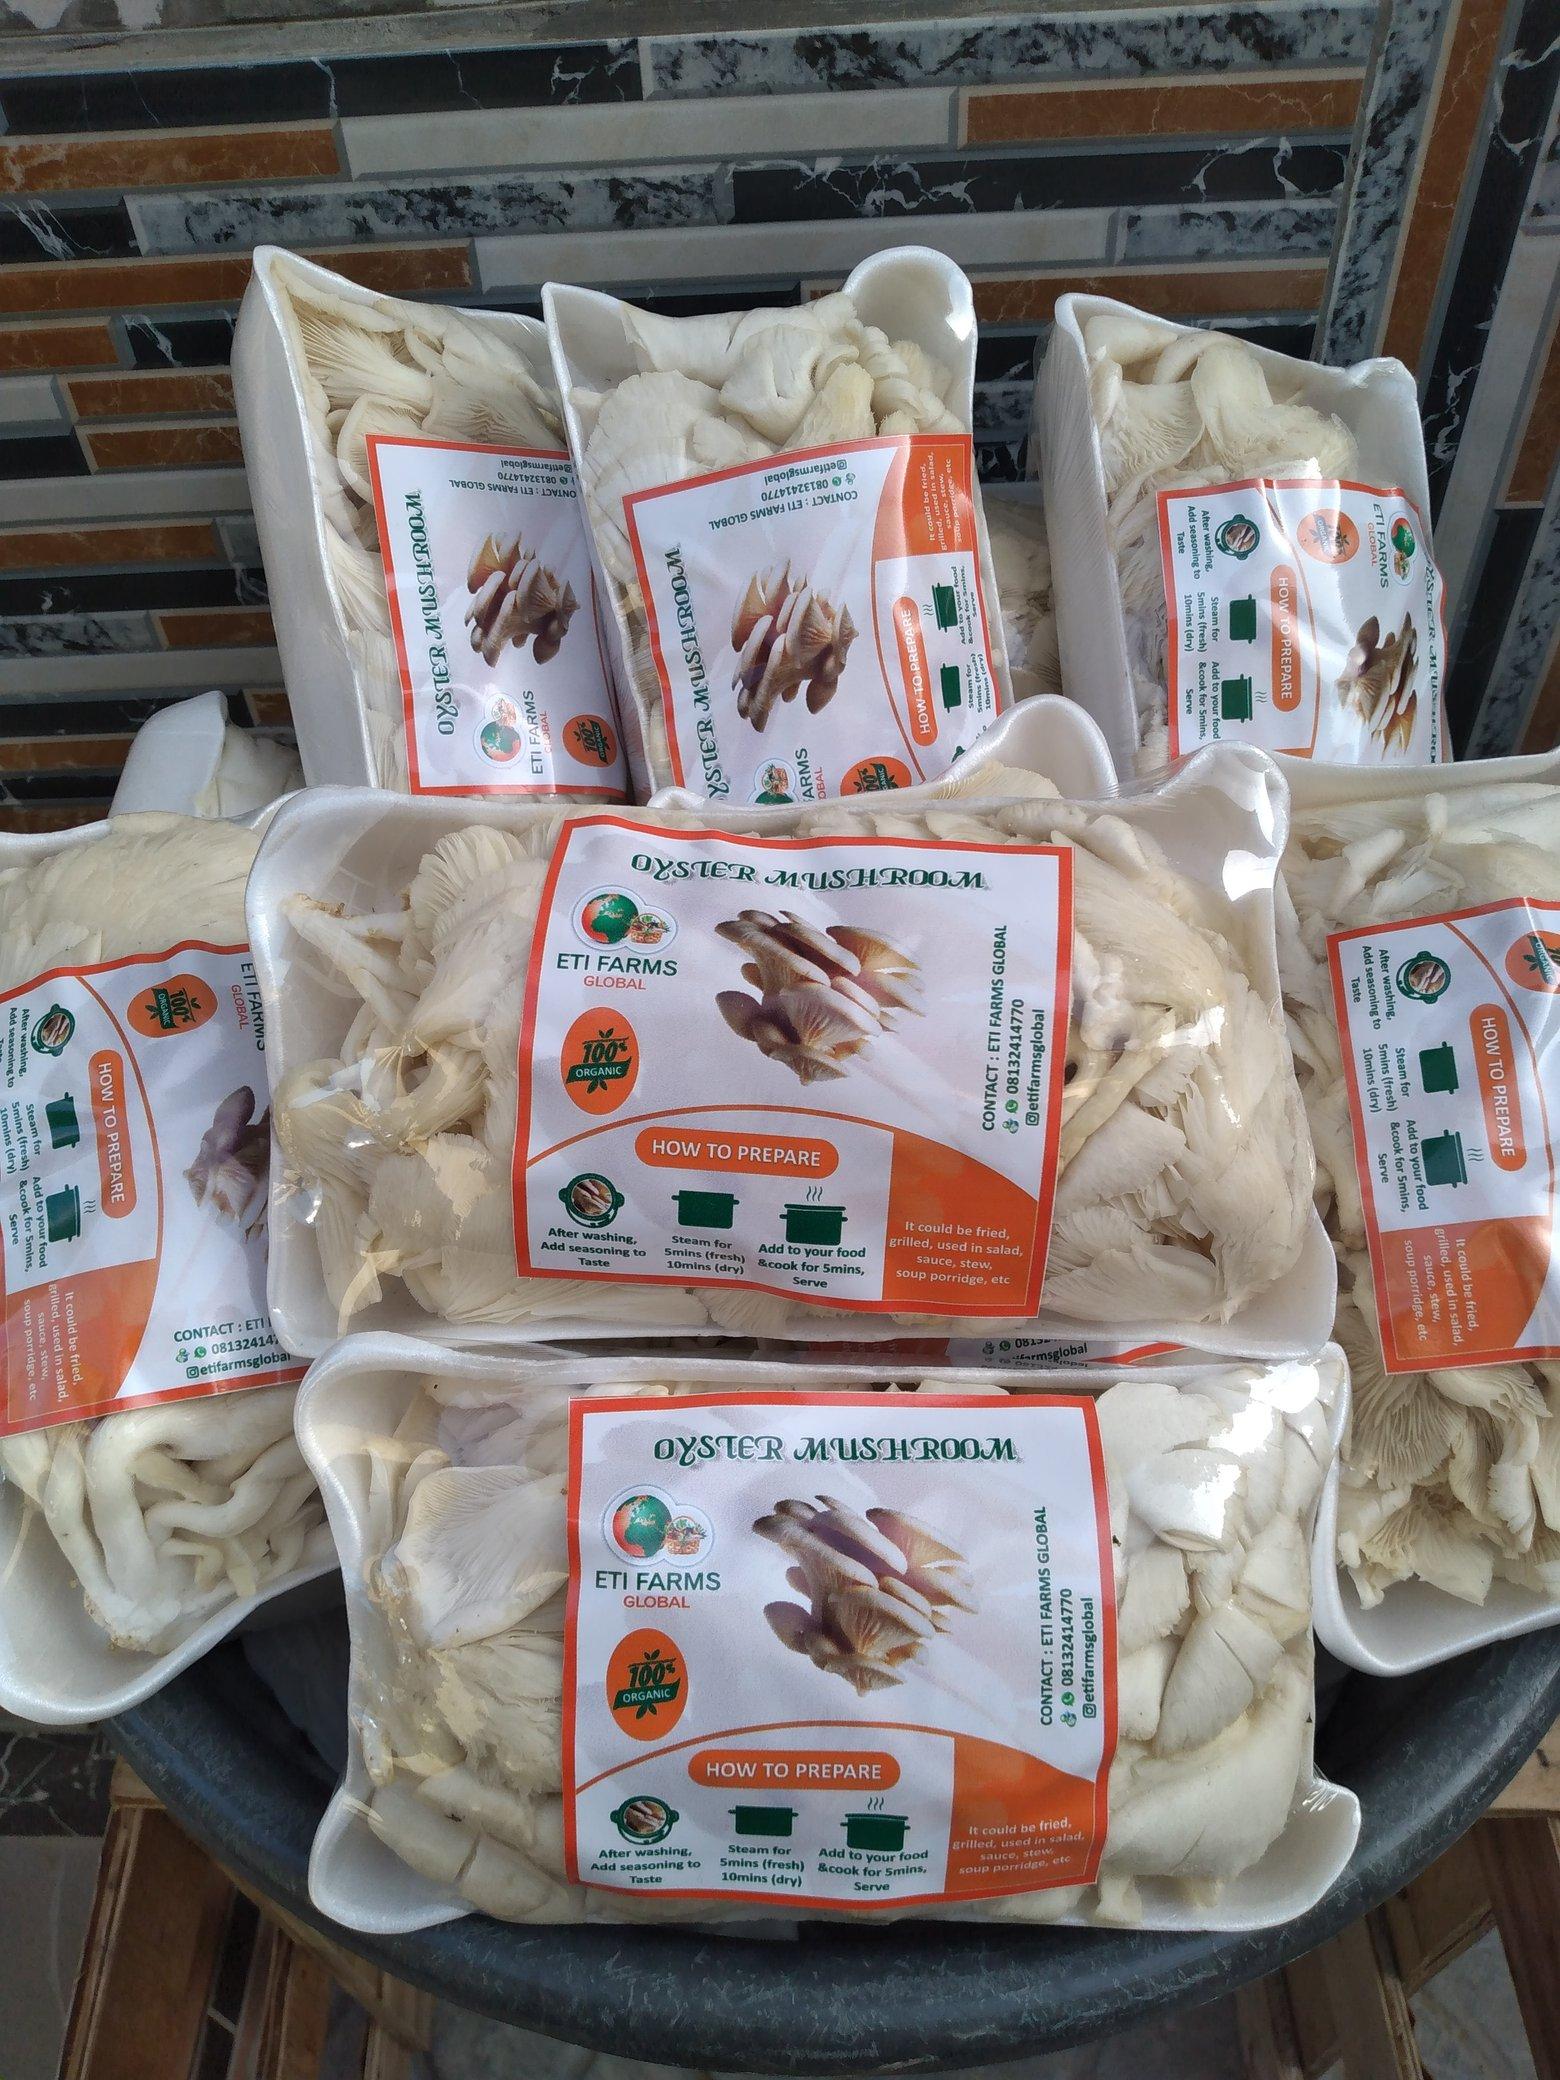 Eti mushroom farming